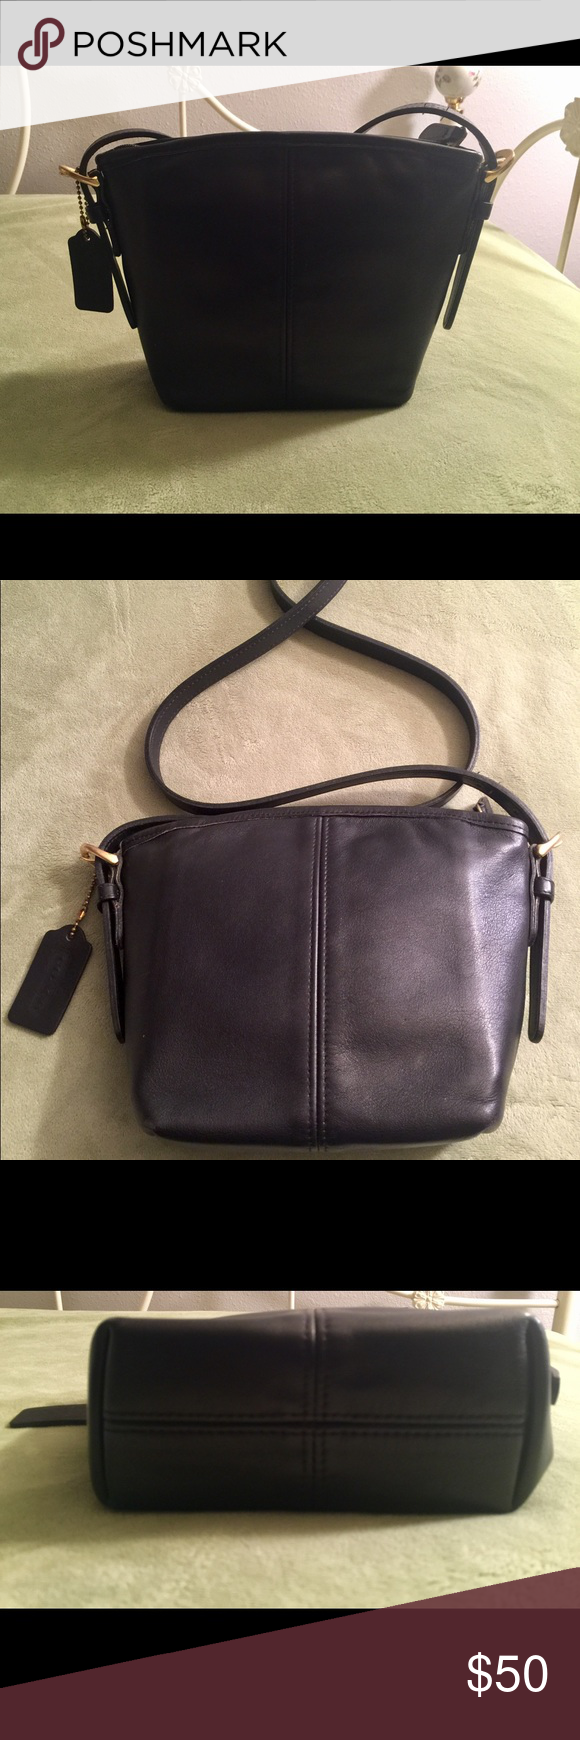 Spotted while shopping on Poshmark  Authentic Vintage Coach 4107 Soft Leather  Purse!  poshmark  fashion  shopping  style  Coach  Handbags 52dbc19e34